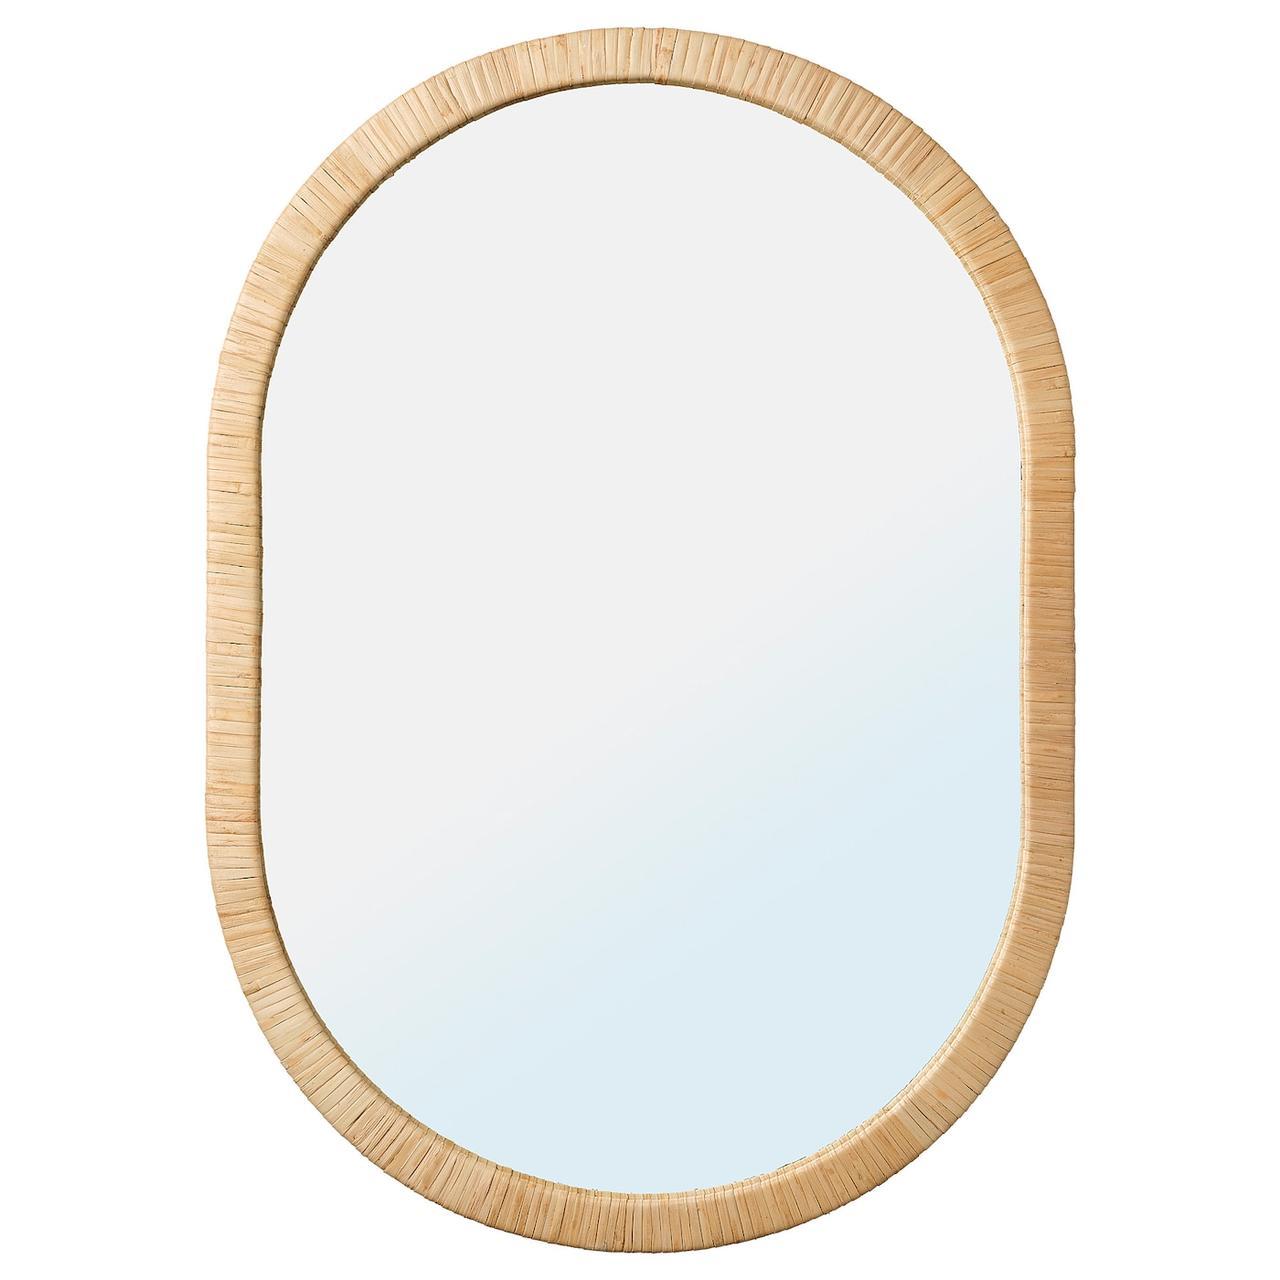 IKEA OPPHEM Зеркало, ротанг 54x77 см